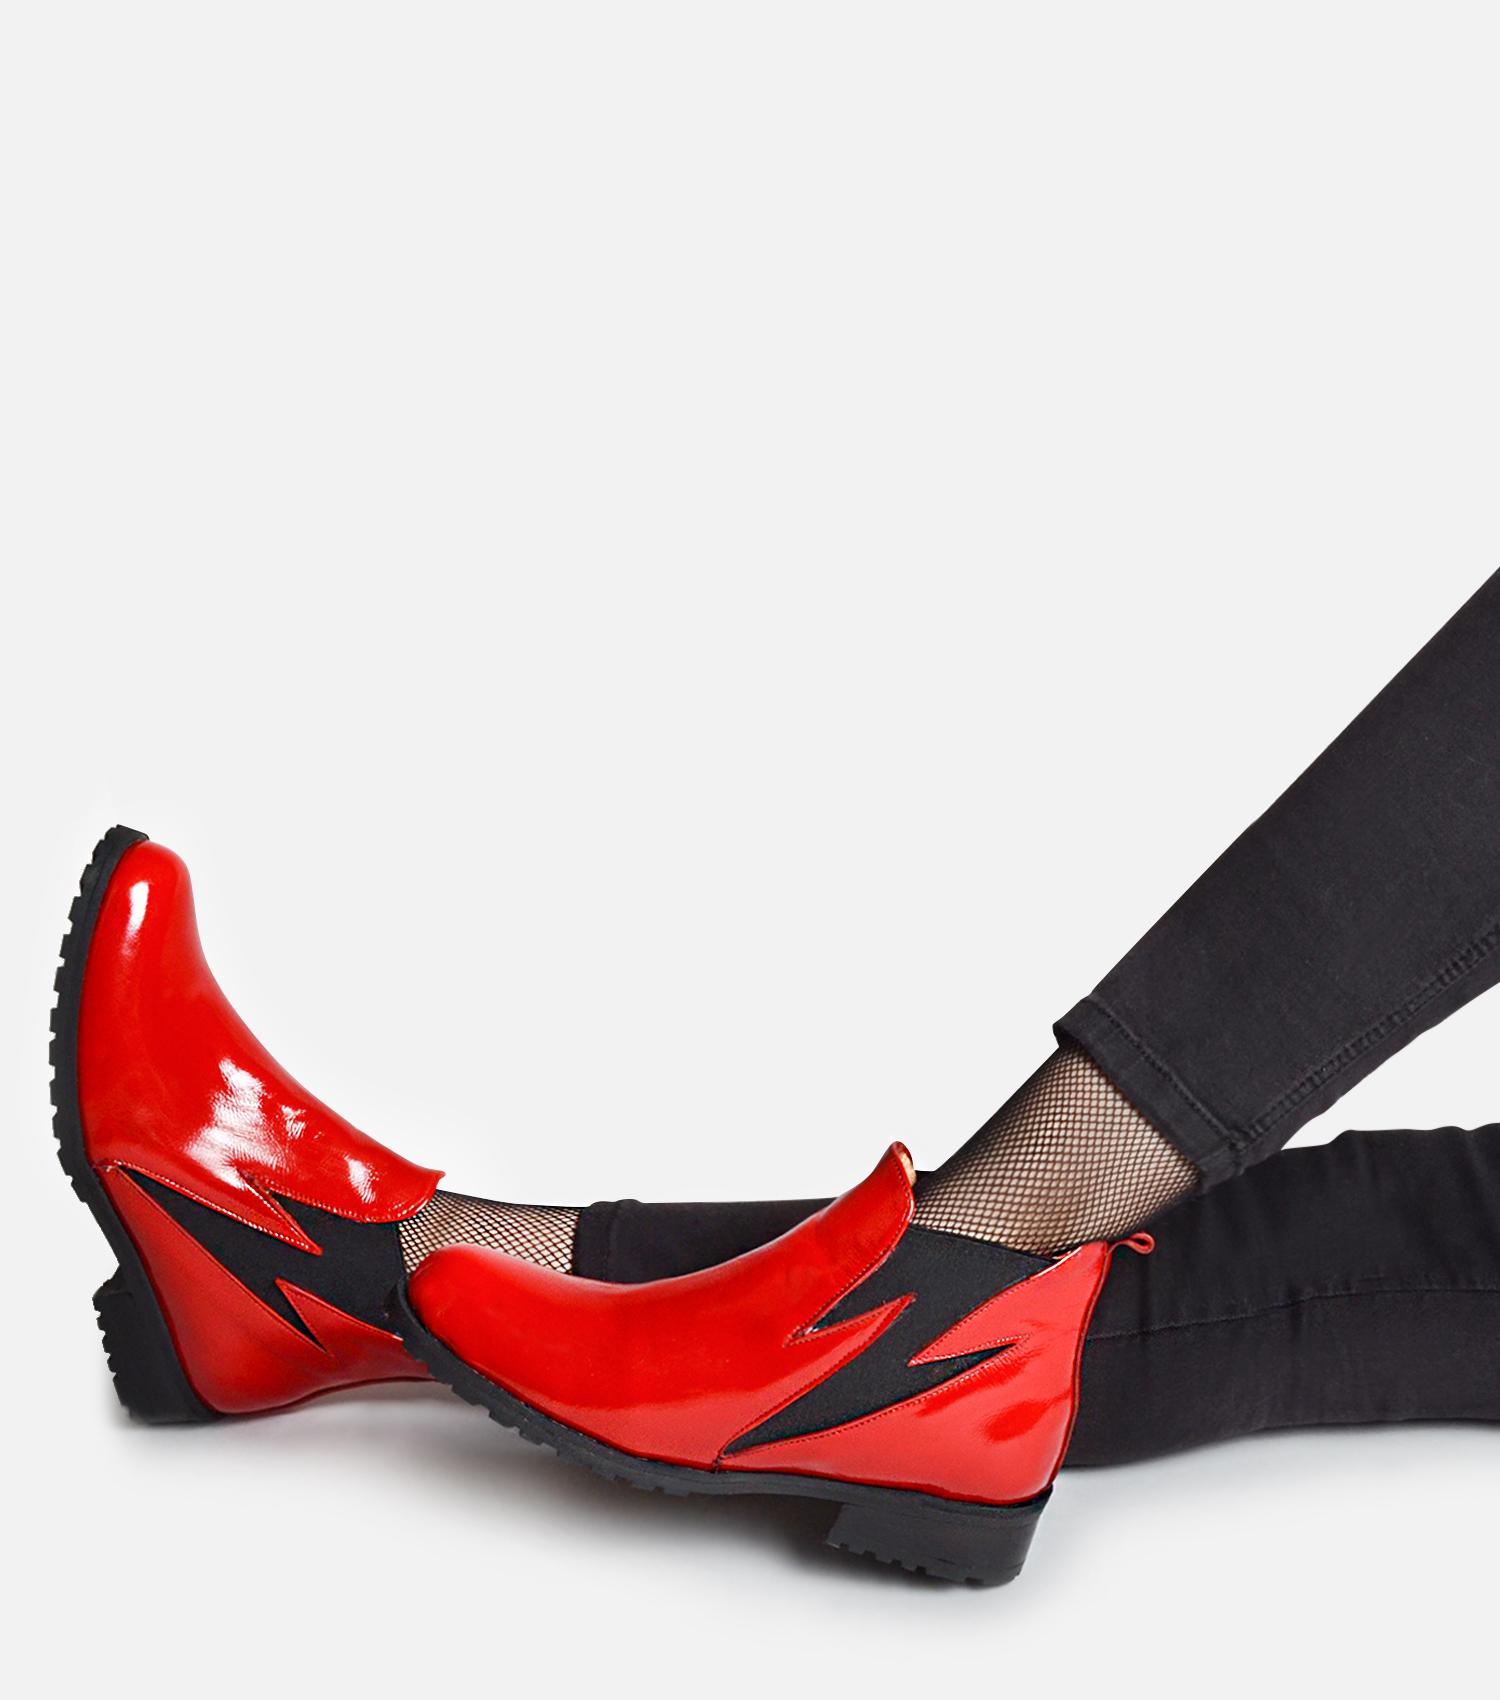 Bowie plano rojo